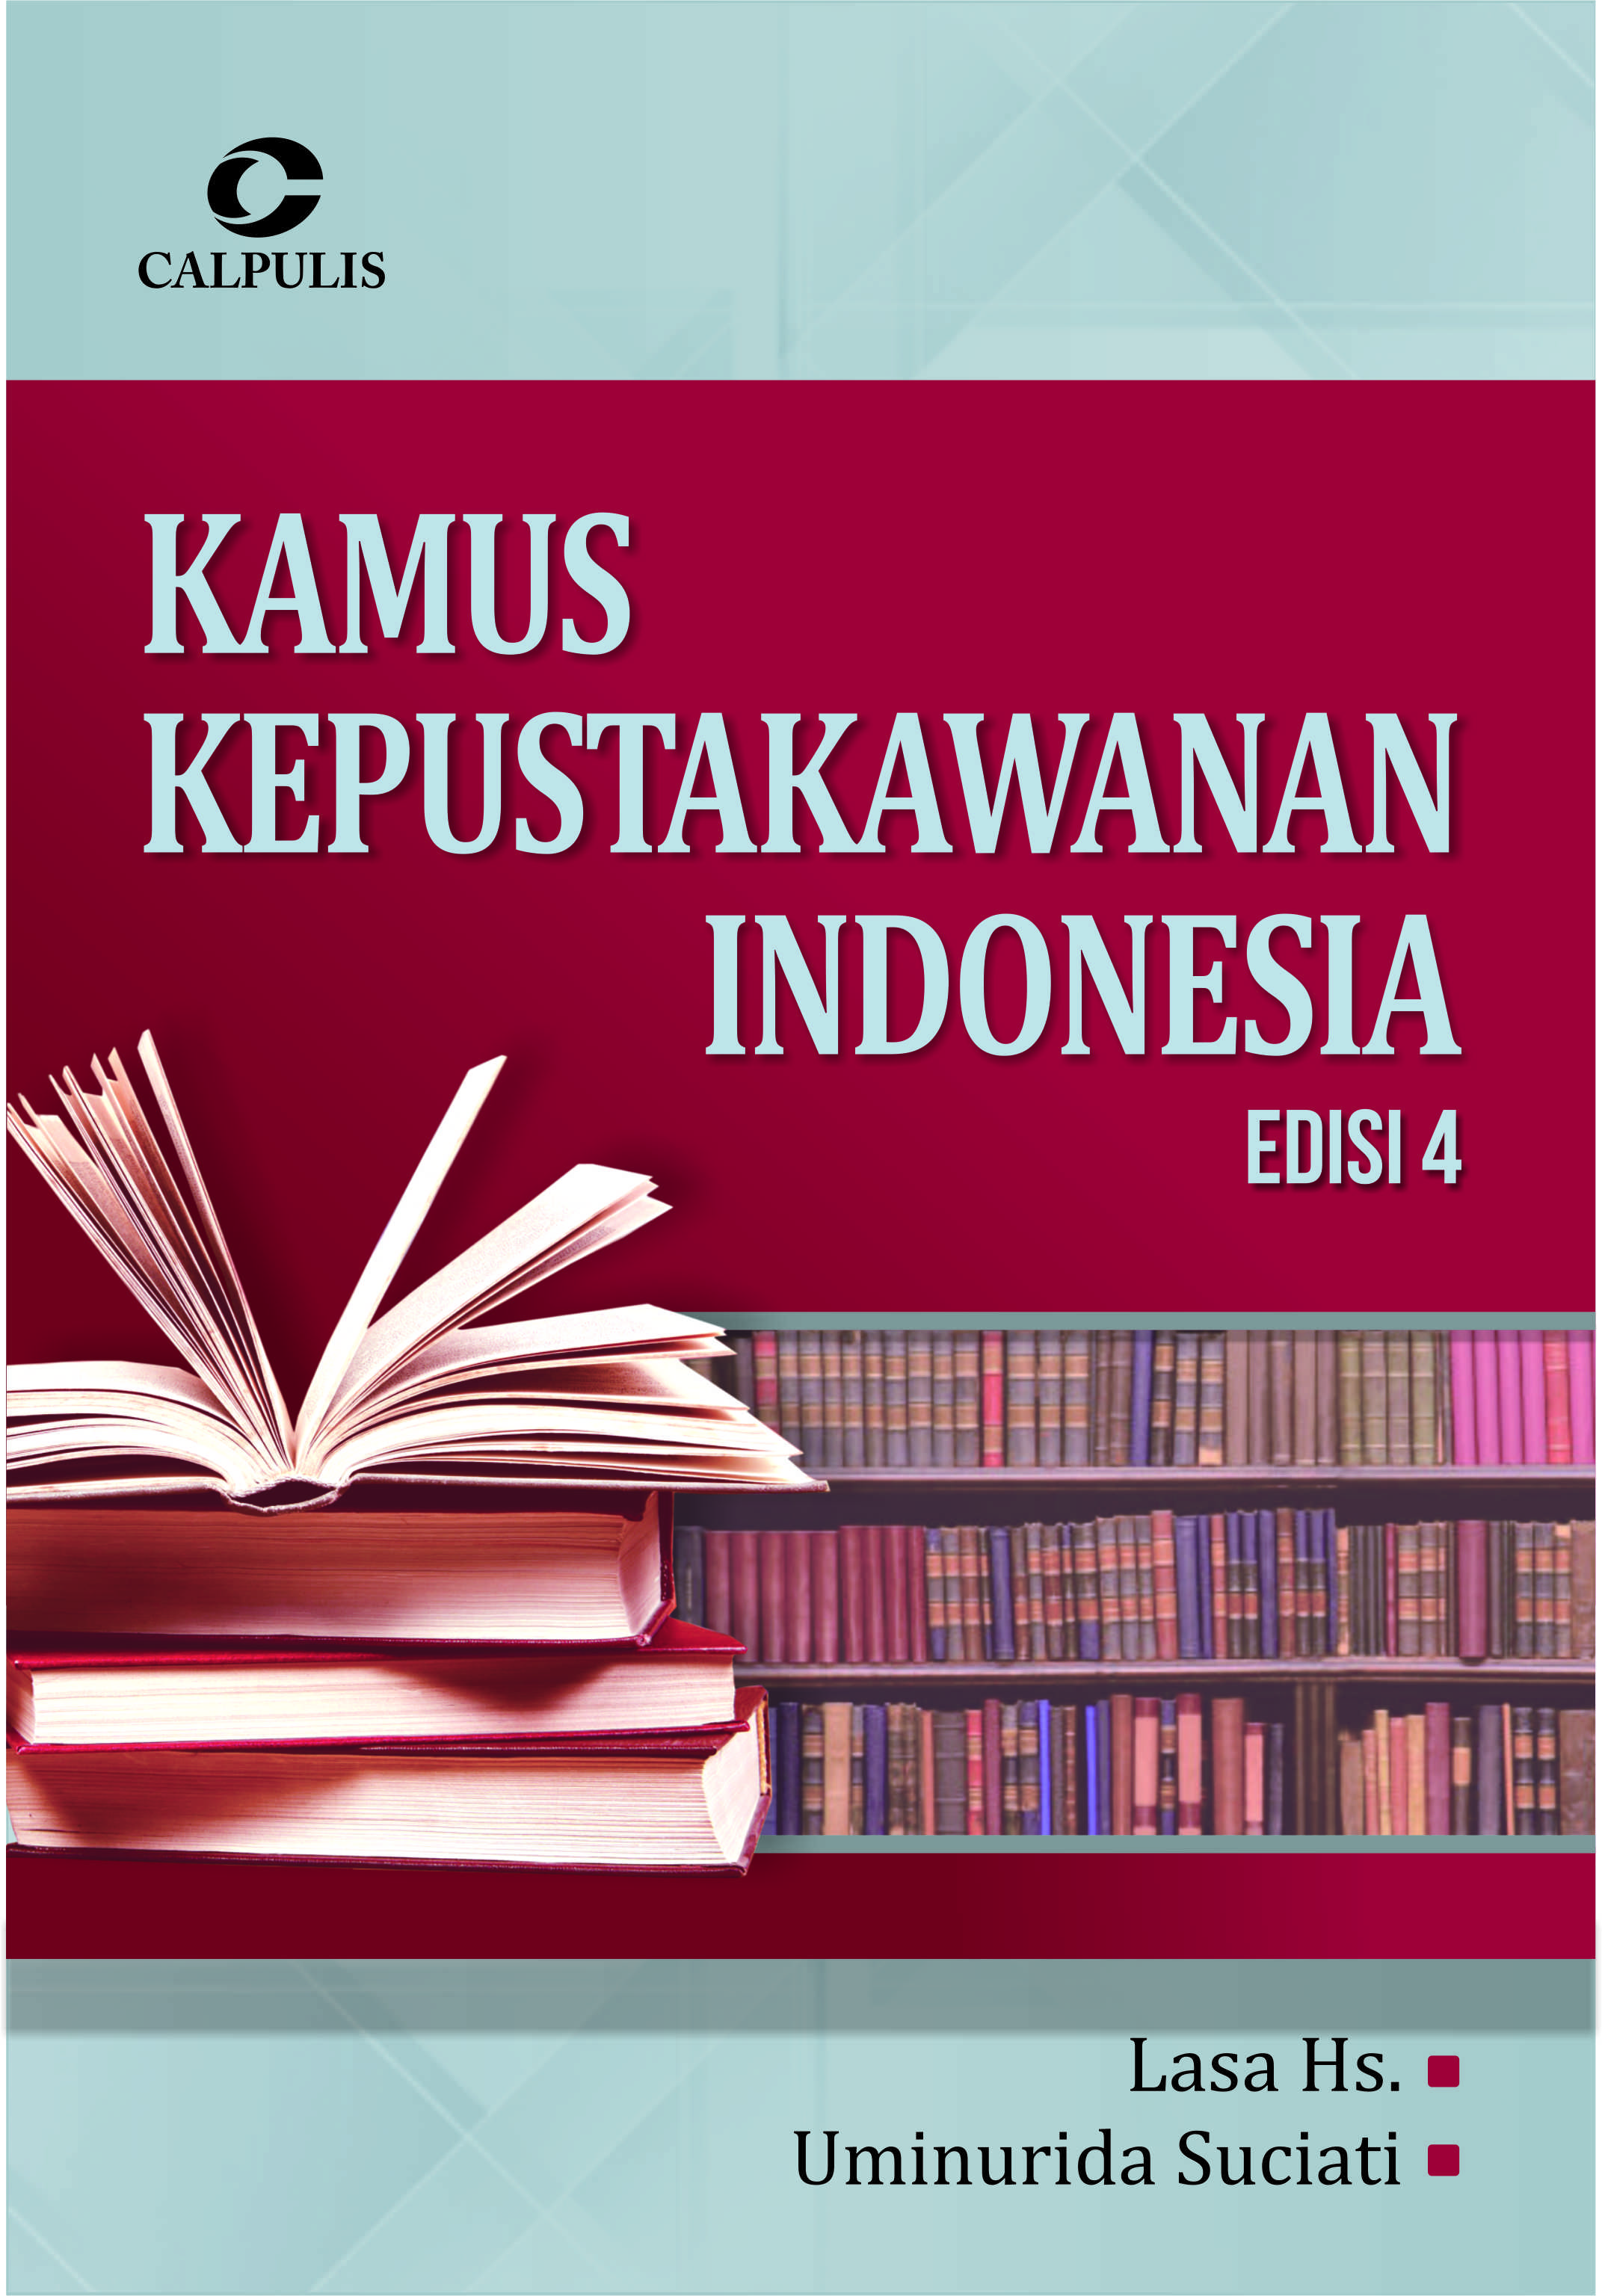 Kamus Kepustakawanan Indonesia Edisi 4